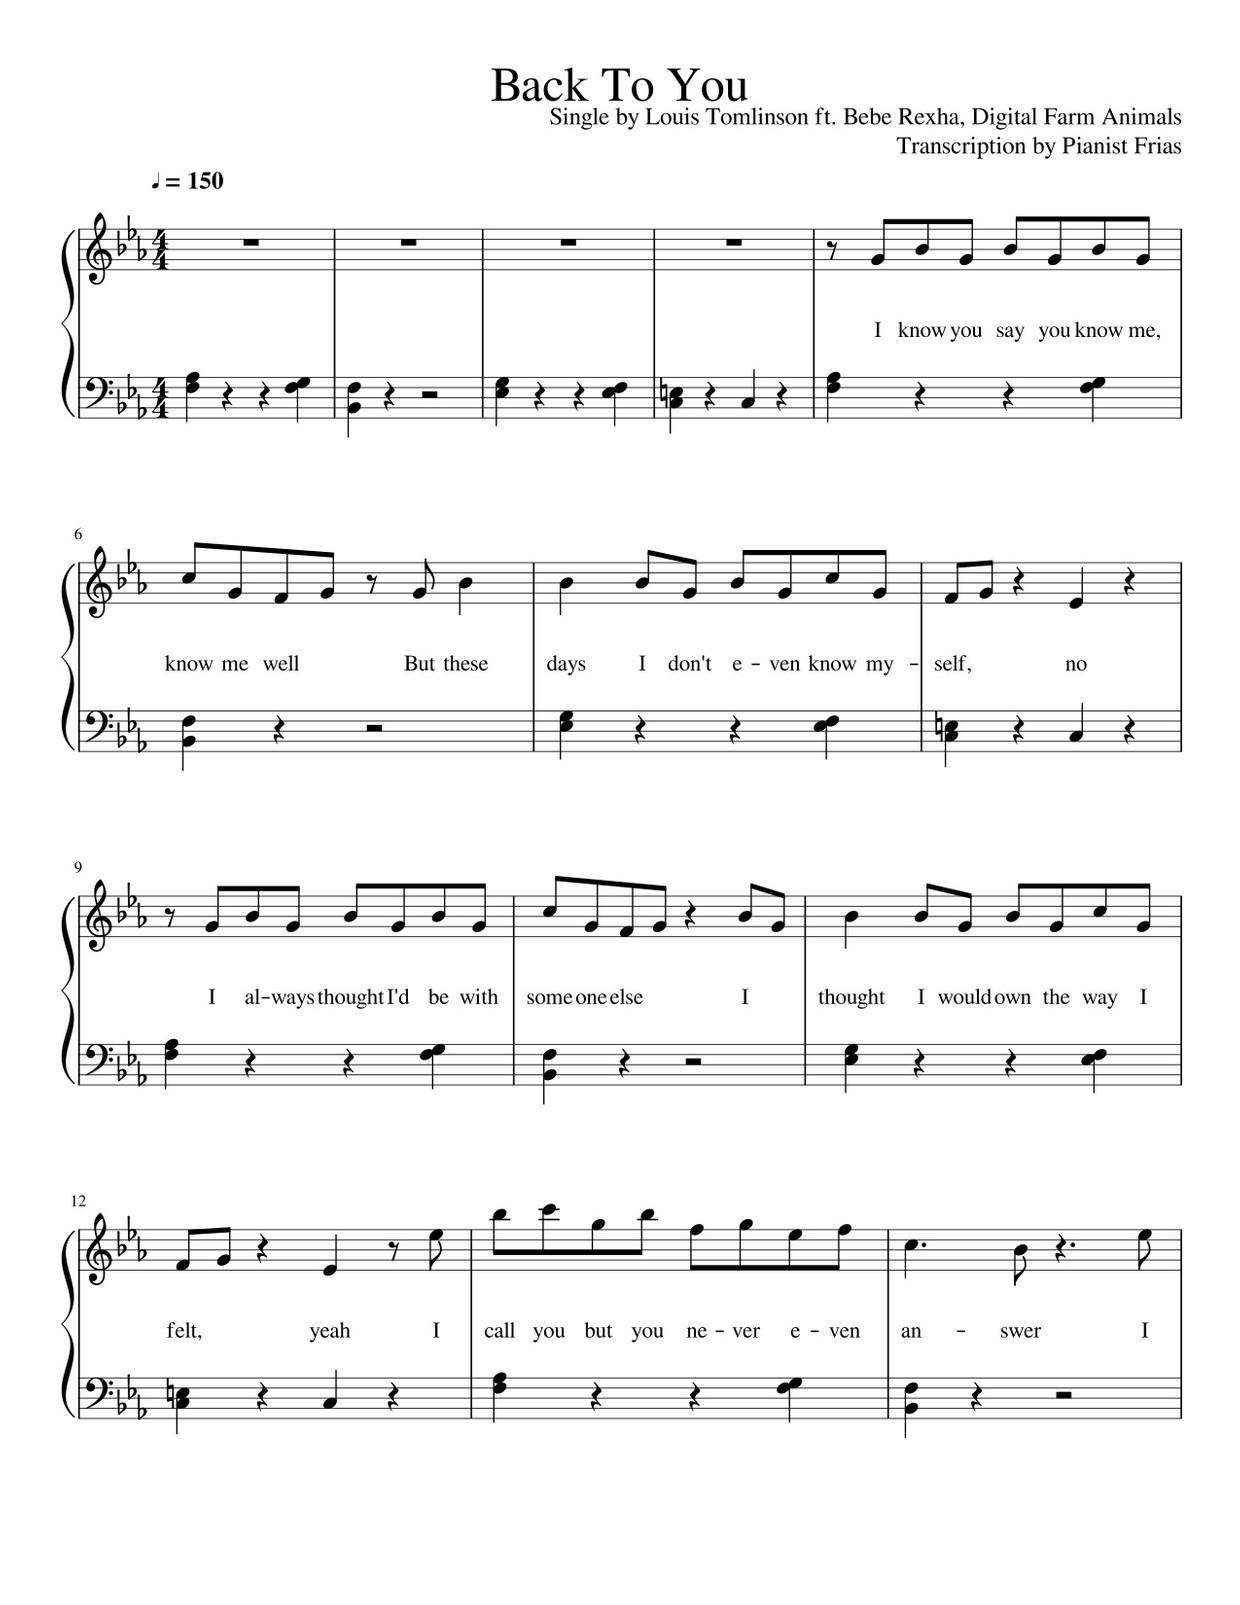 Louis Tomlinson ft. Bebe Rexha, Digital Farm Animals - Back To You (pdf)